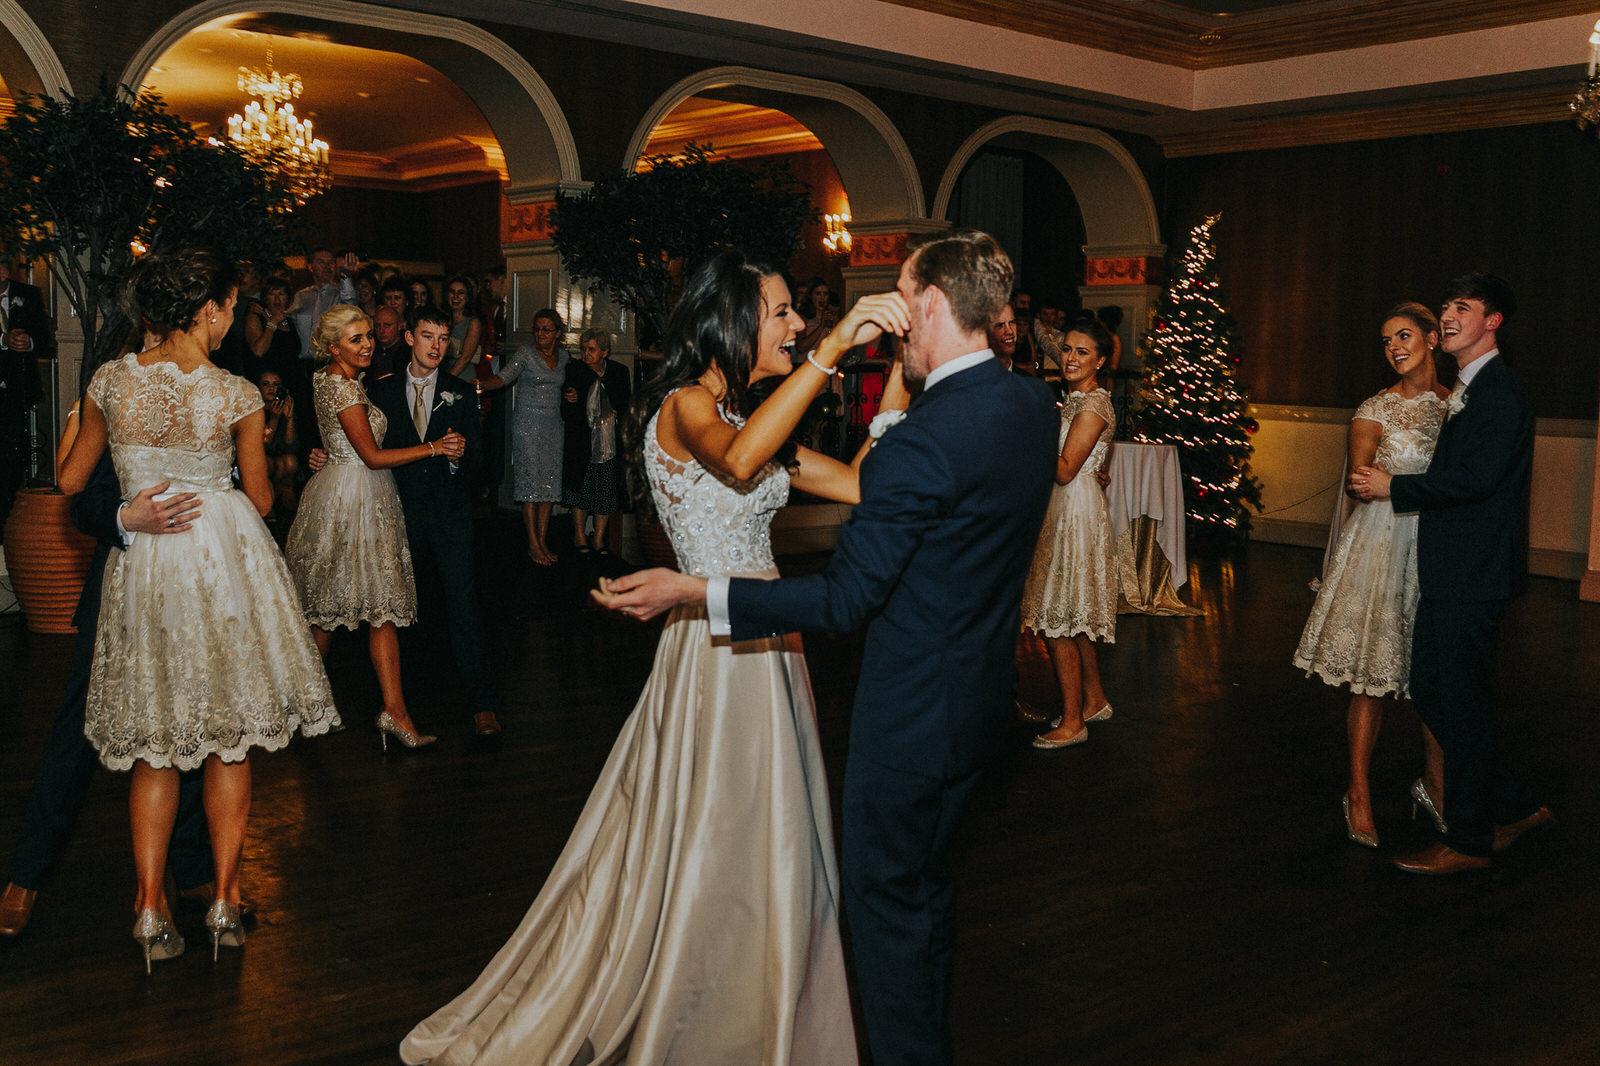 Roger_Kenny_wedding_photographer_521.jpg